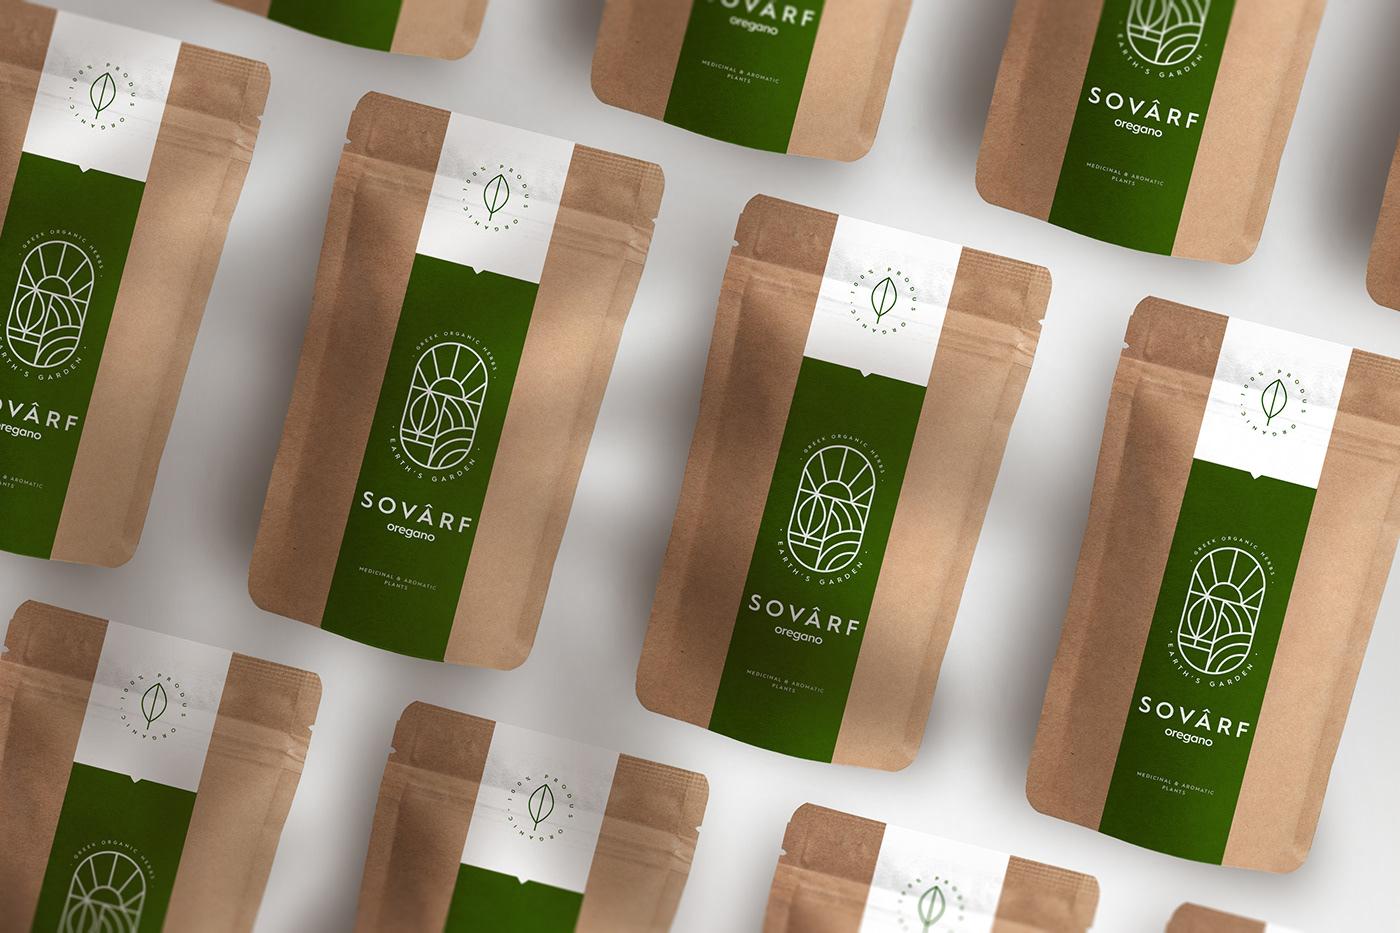 branding ,ILLUSTRATION ,logo,logodesign,oregano,organicproduct,Packaging,productpackaging,tea,brand